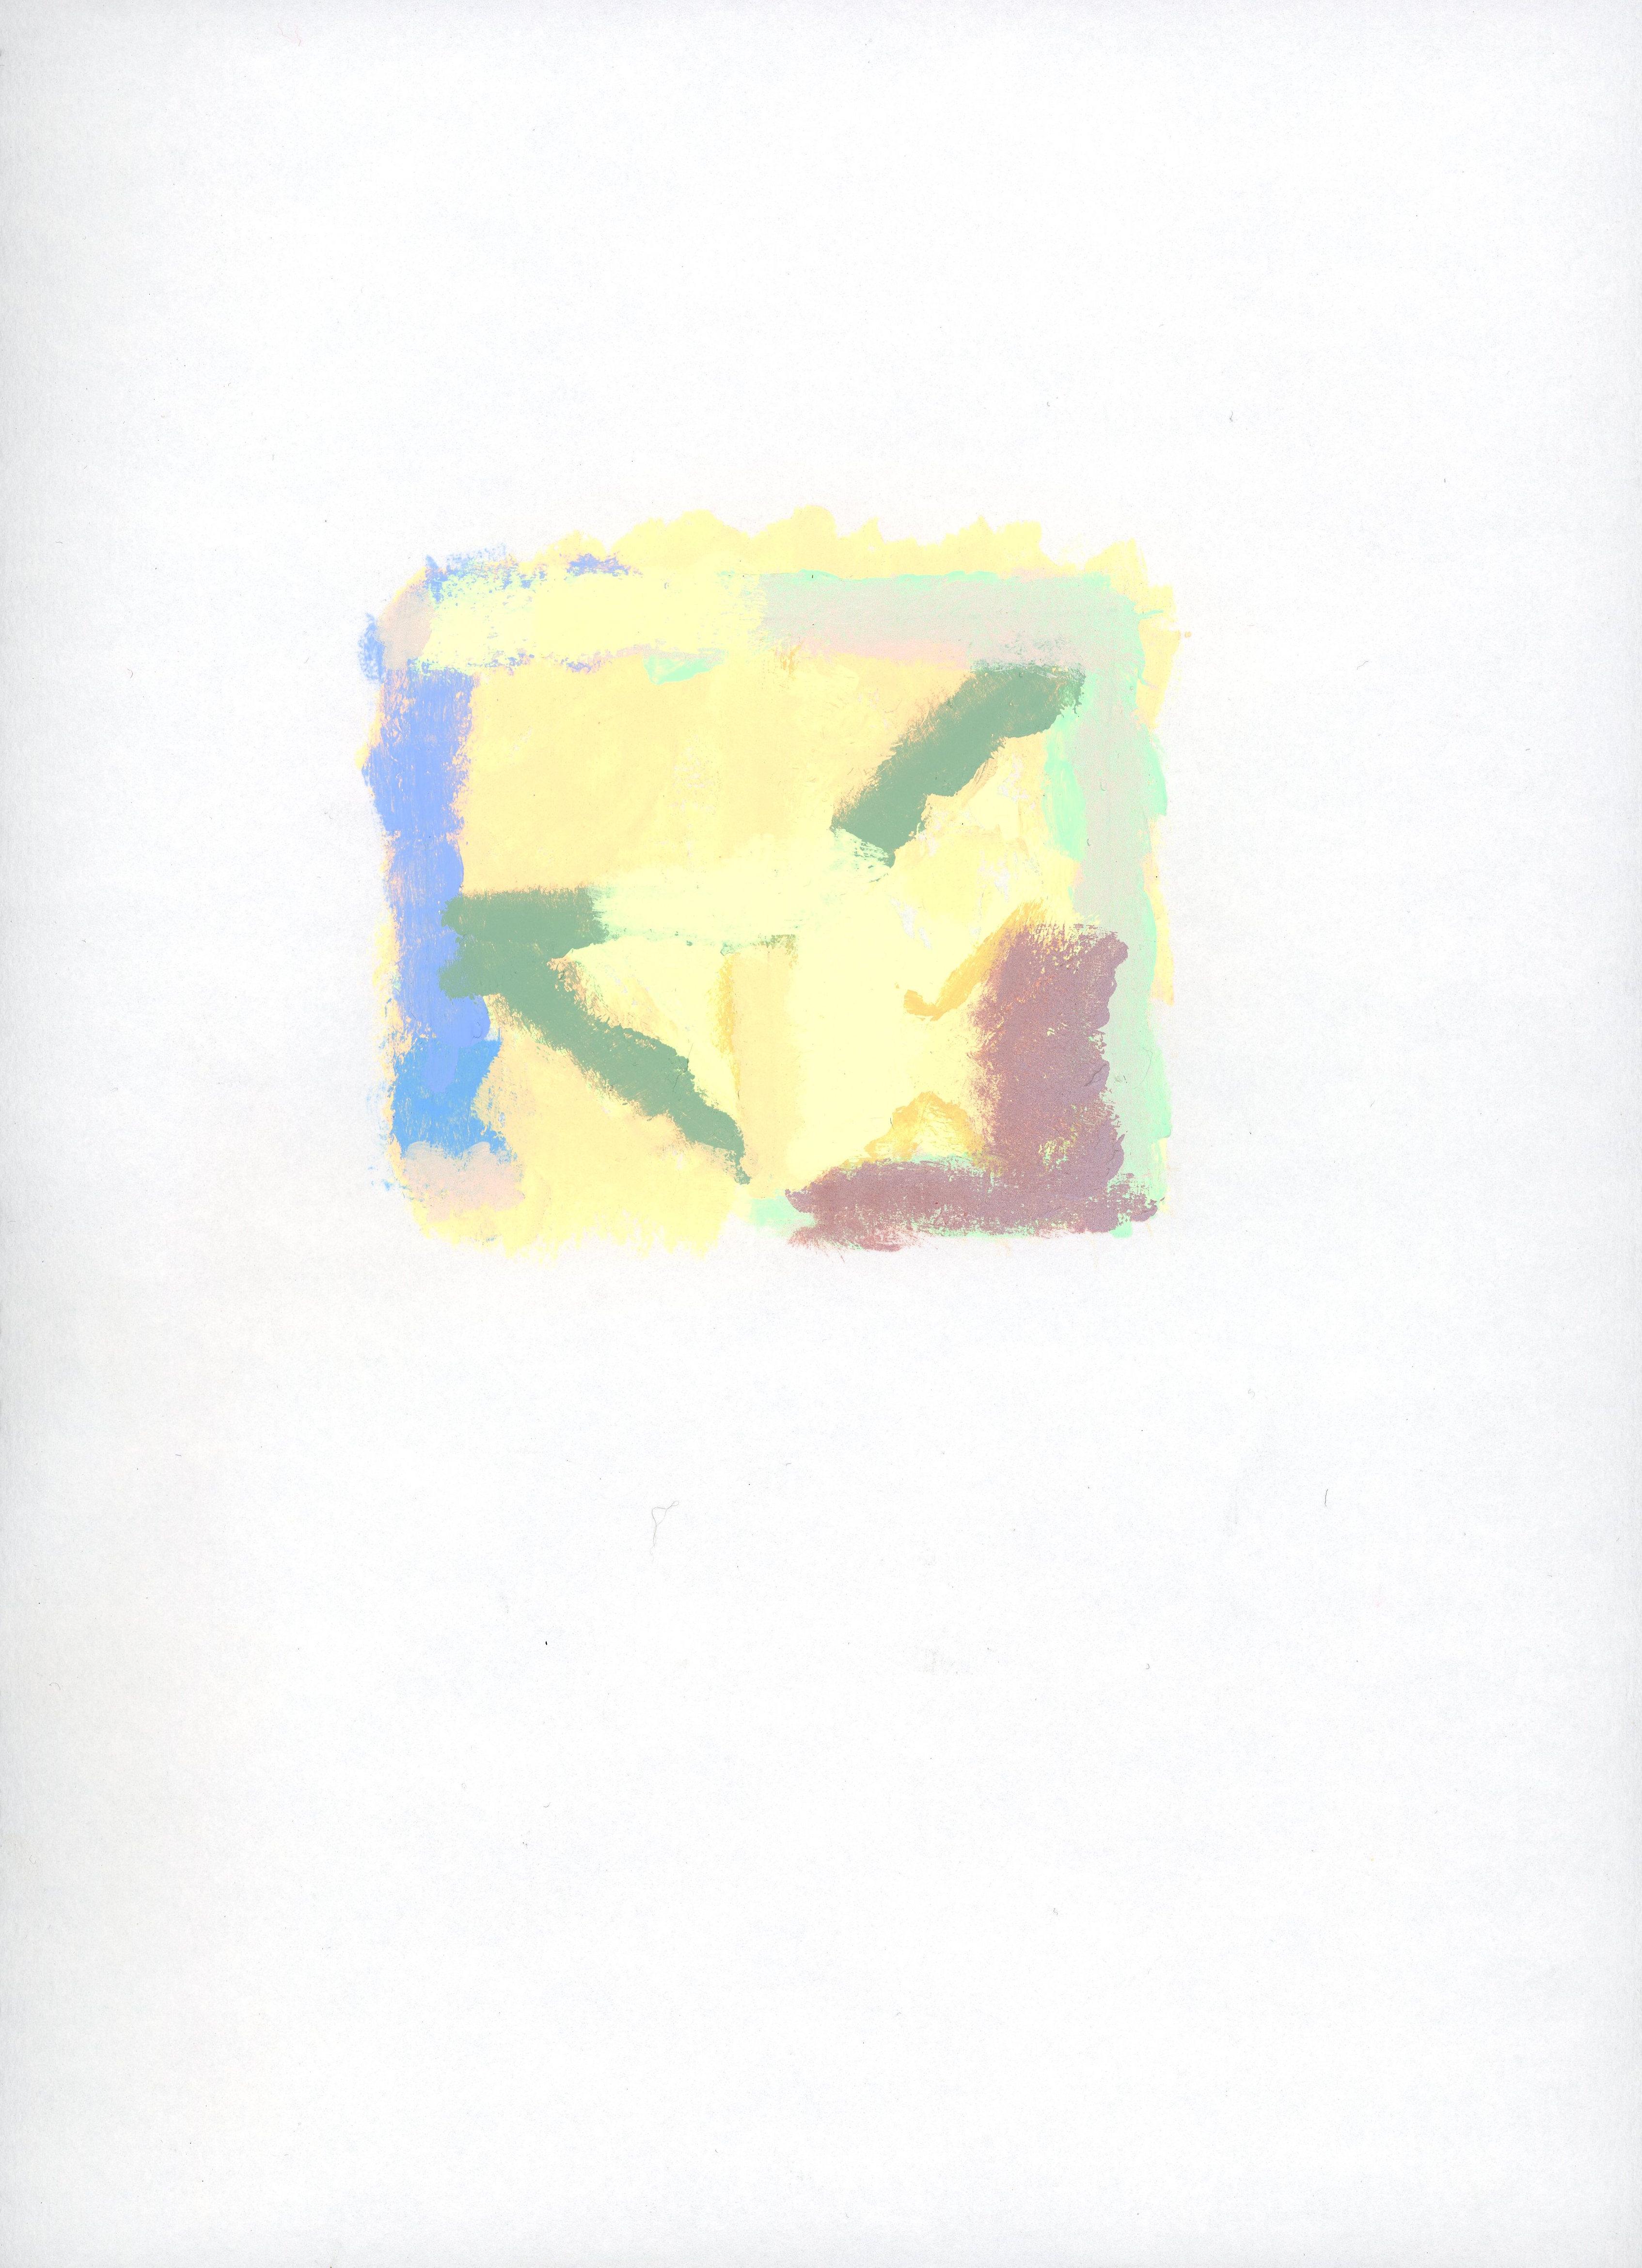 53_Fiftythree (31cmx23cm)